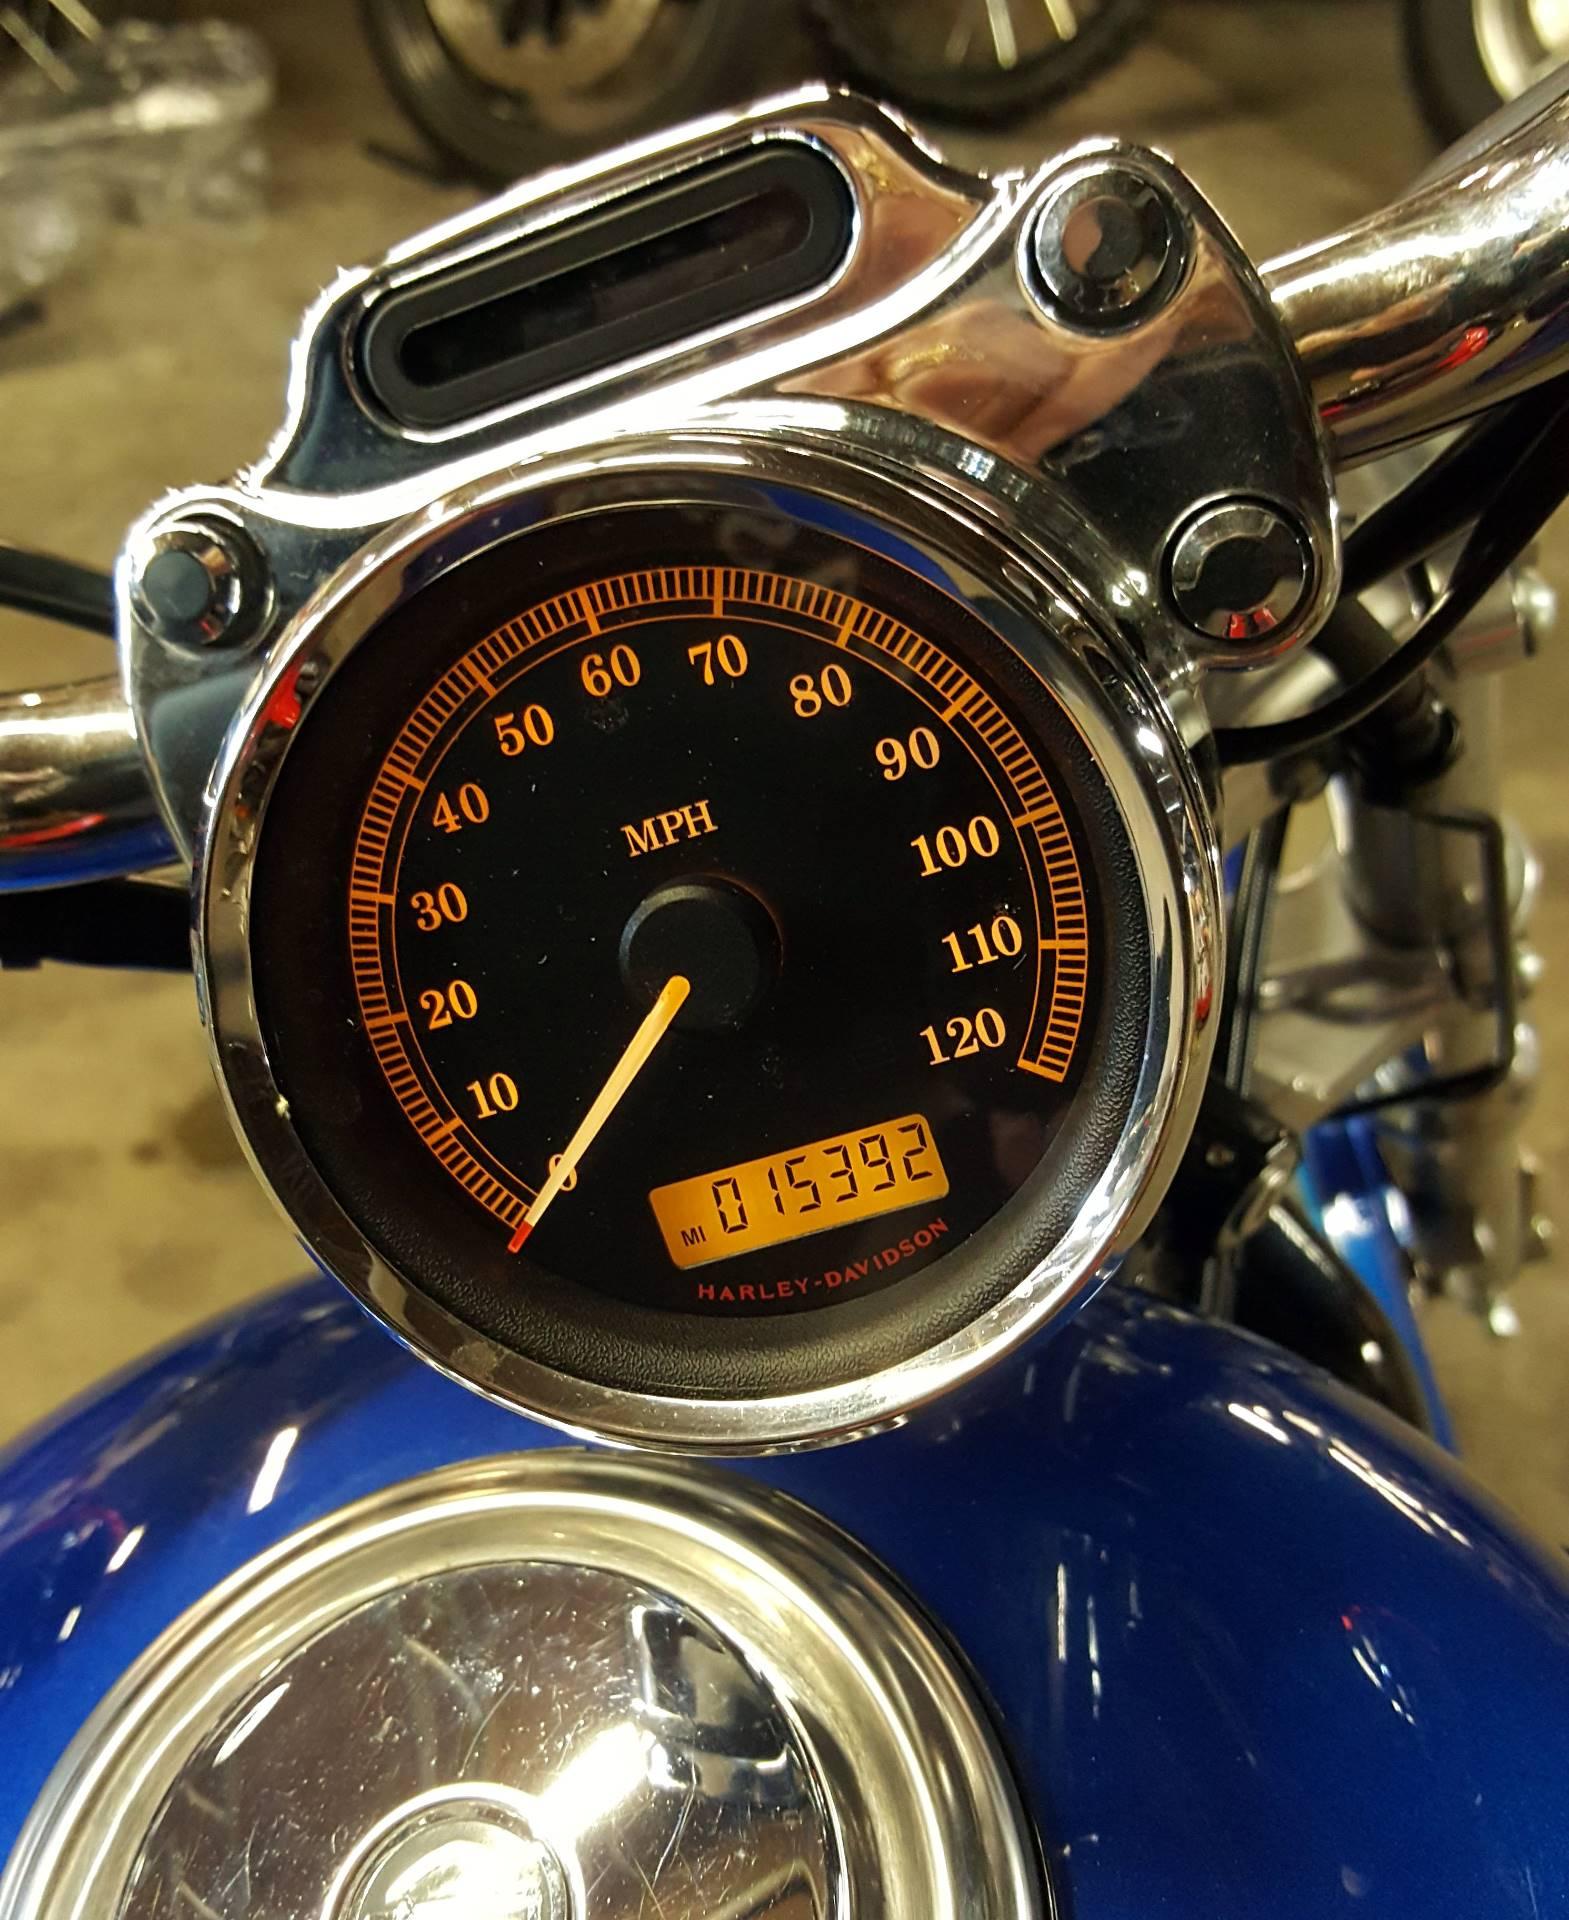 2009 Harley-Davidson Sportster 1200 Custom 3